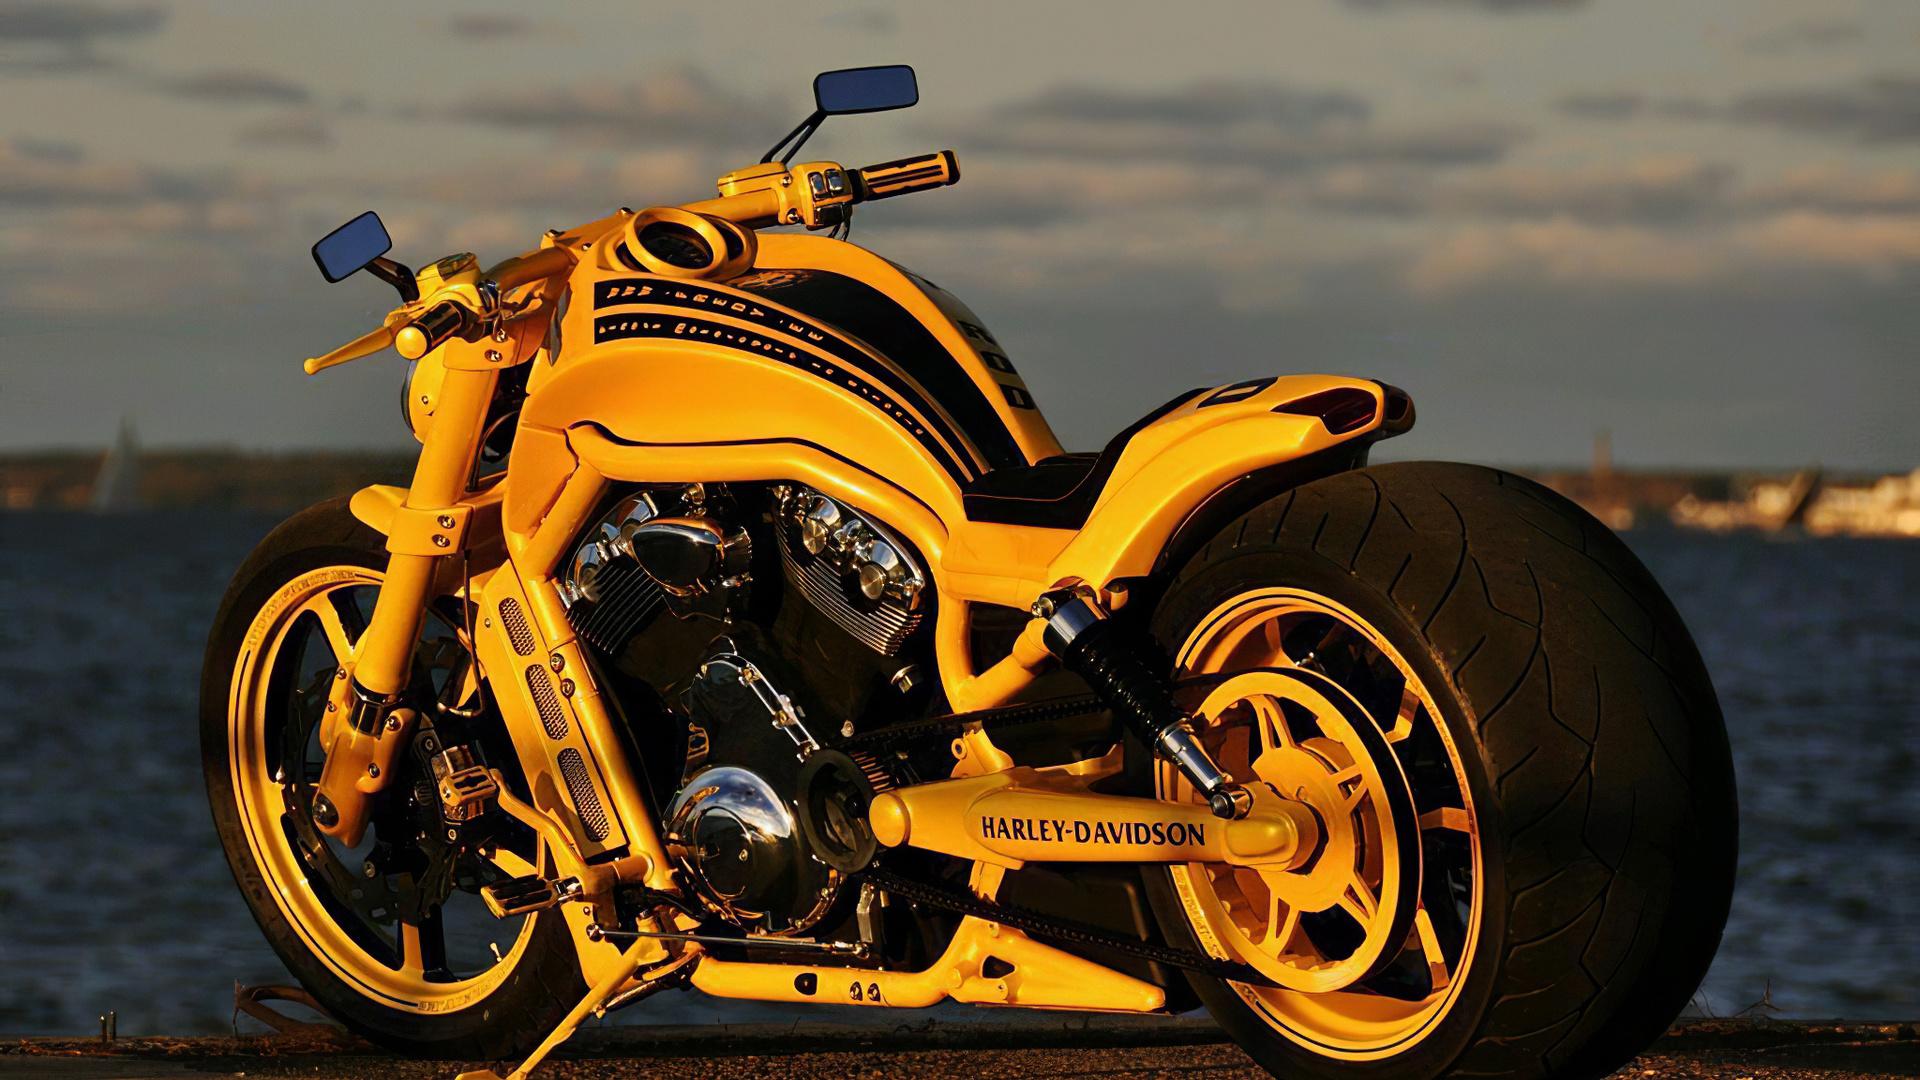 harley davidson, beach, mirror, road, motorcycle